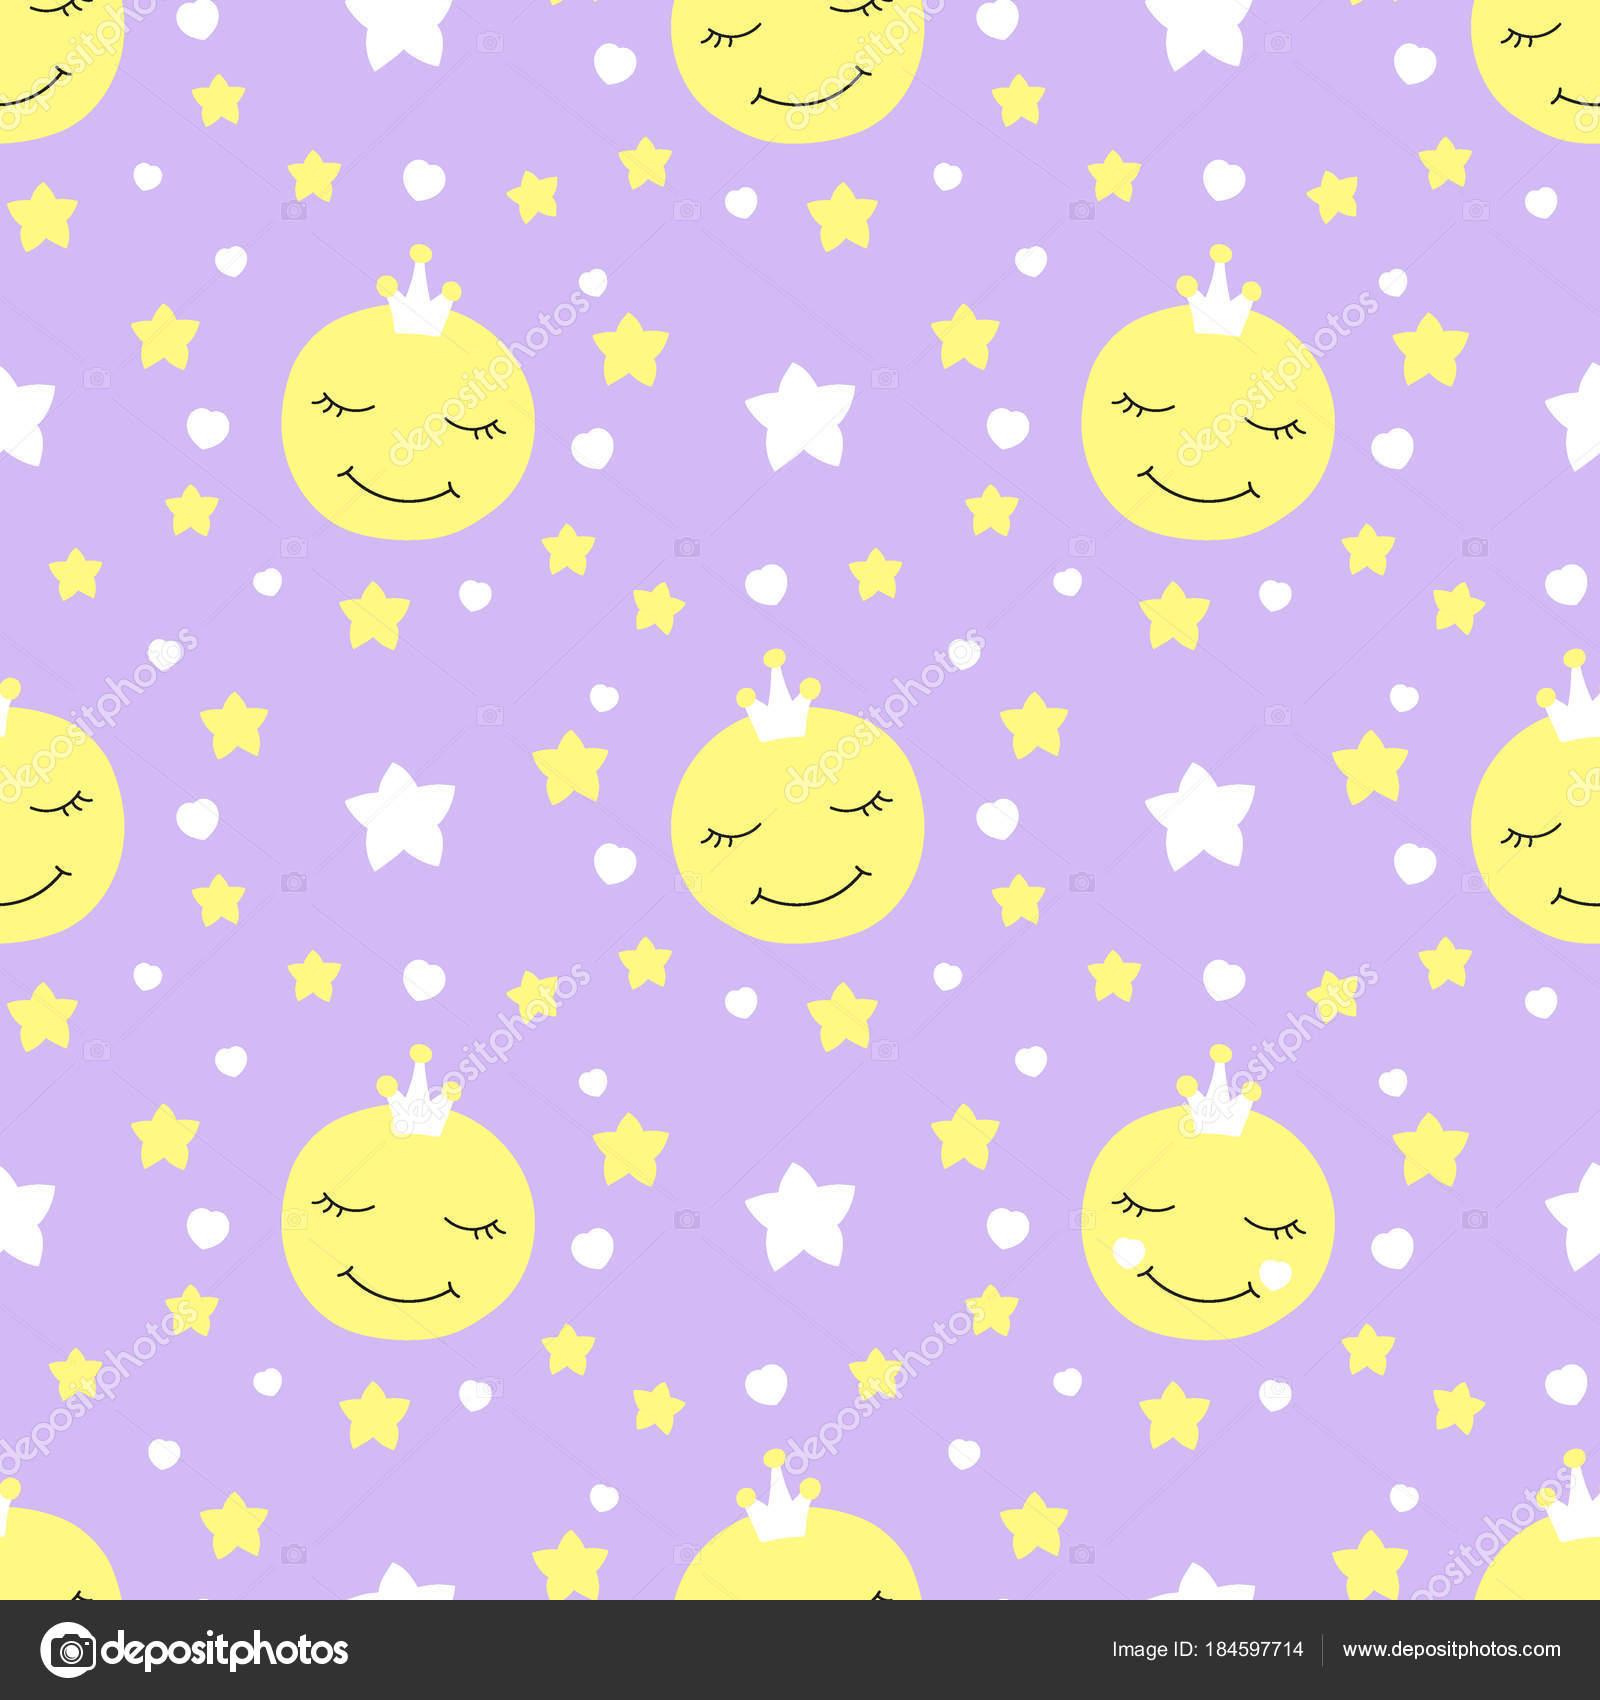 Niedliche Baby Mond Muster Vektor nahtlose — Stockvektor ...